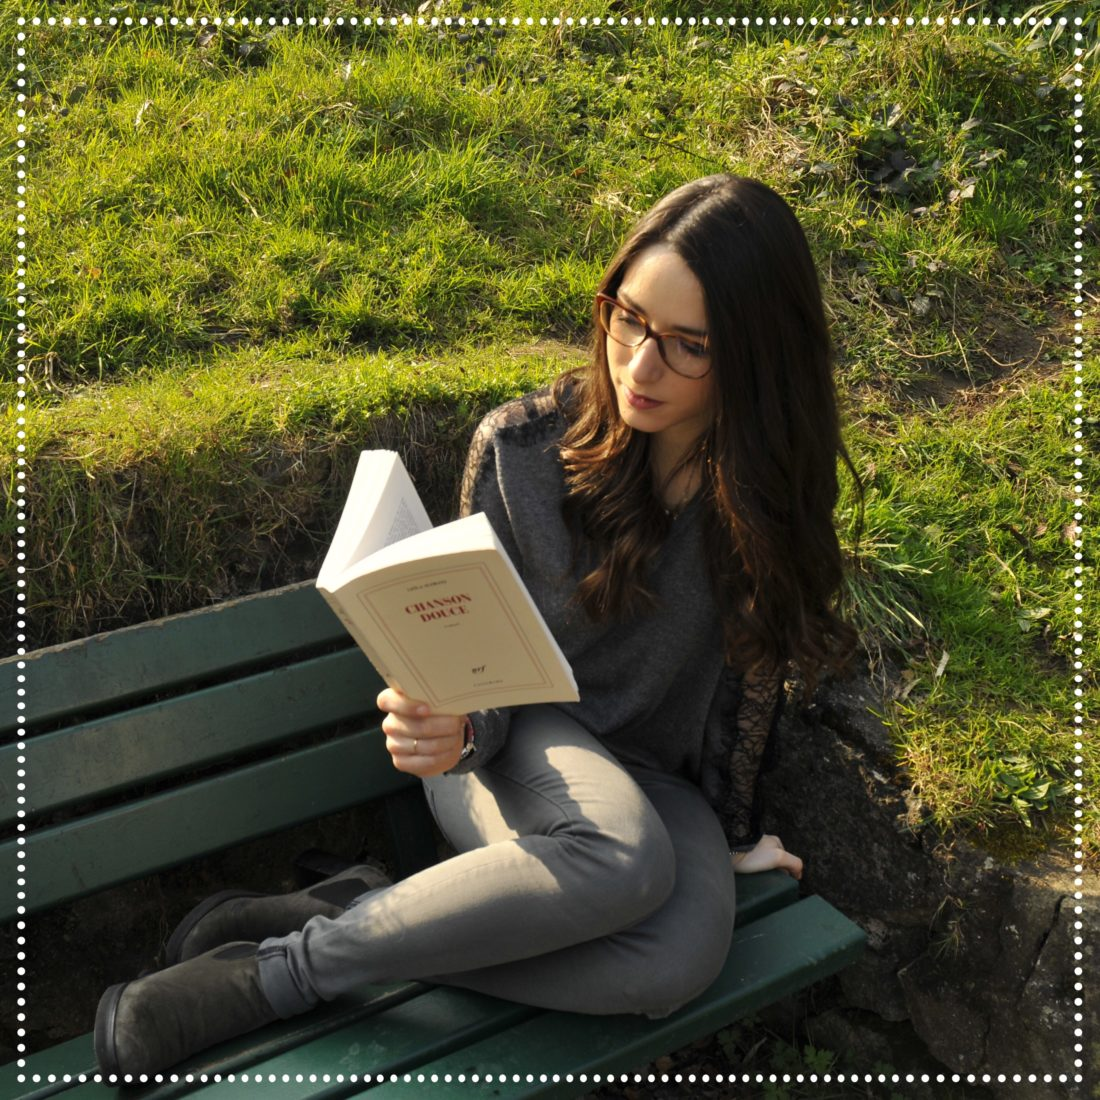 booksnjoy - chanson douce - leila simani - goncourt